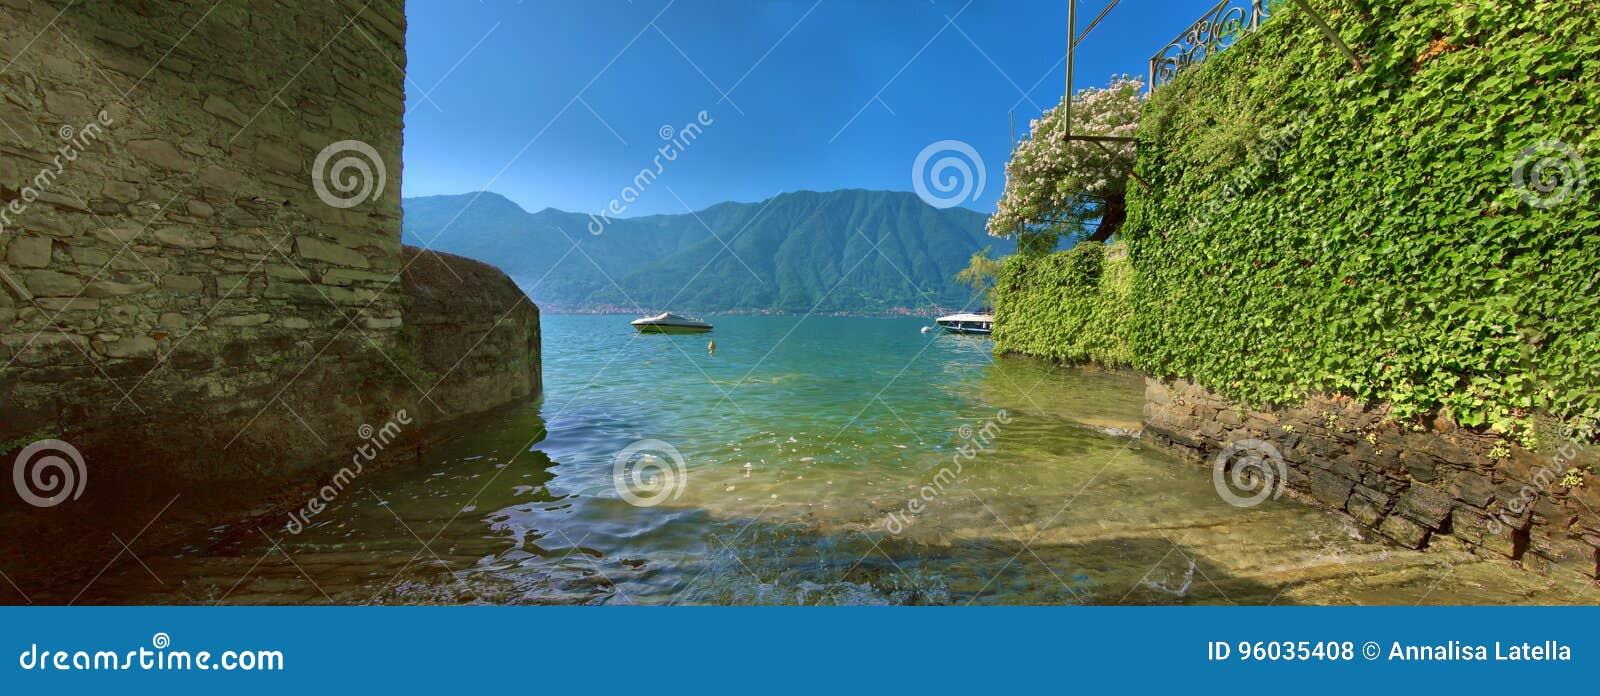 Panorama od Ossuccio, Jeziorny Como